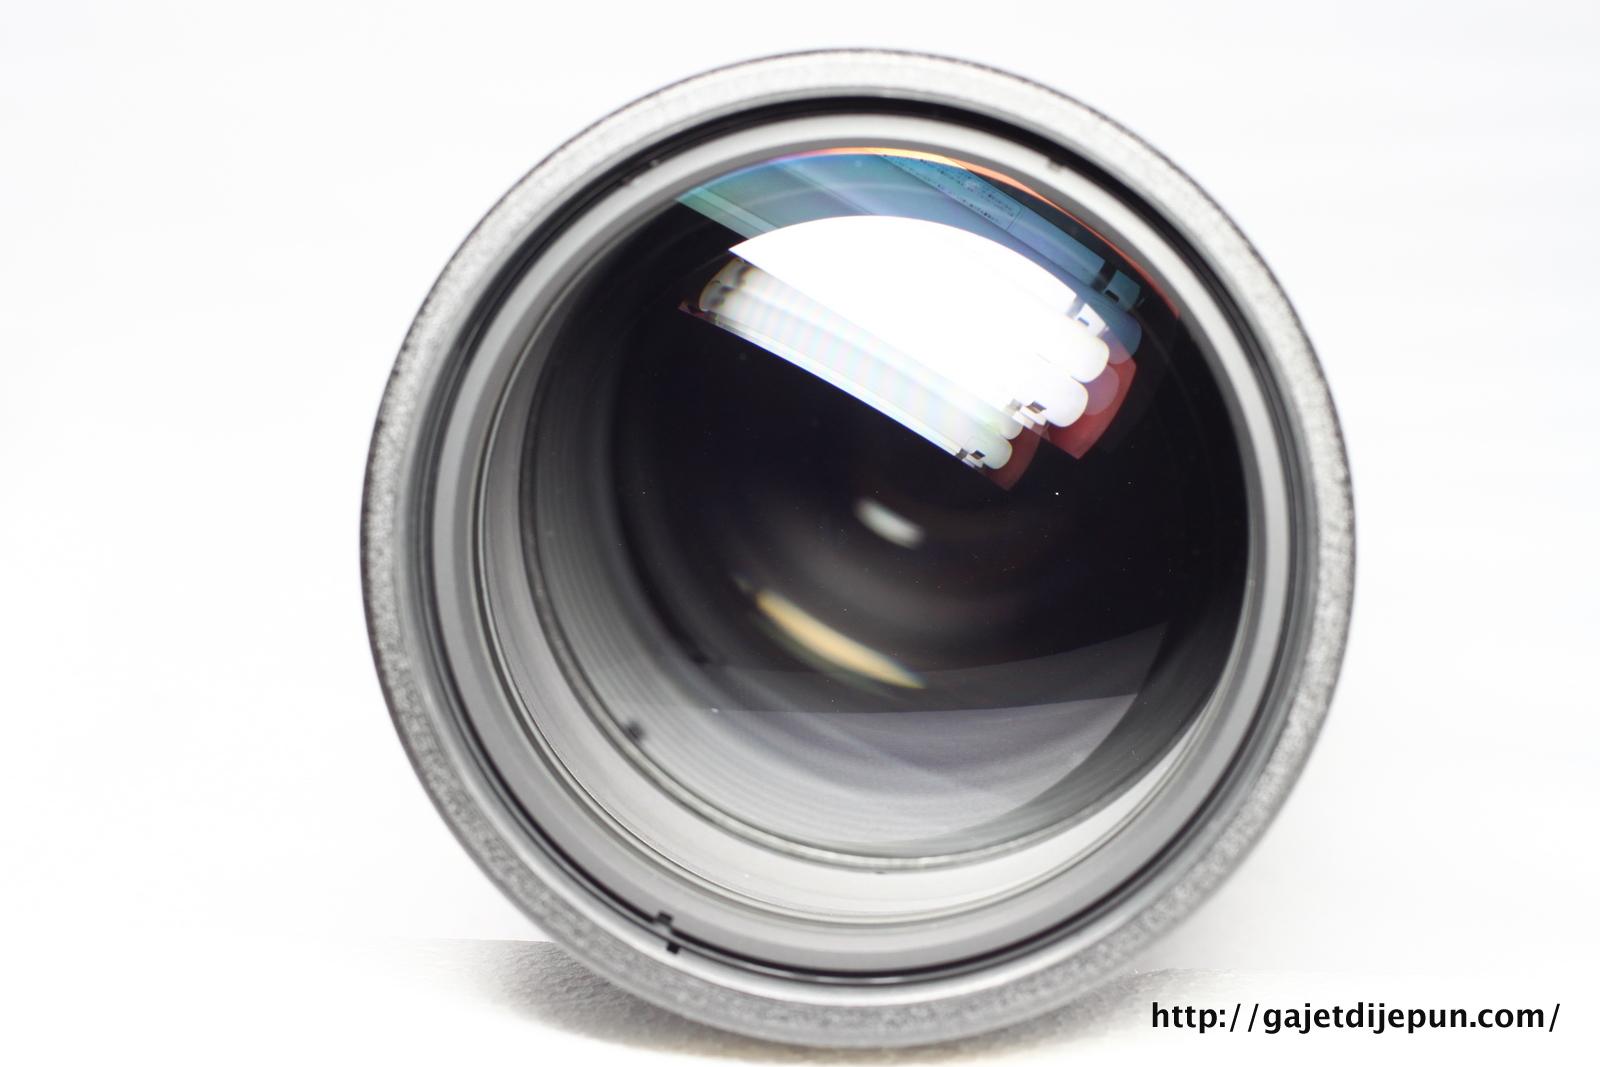 SOLD] Tokina AT-X 828 AF Pro 80-200mm f/2.8 SD (Nikon) [a309]